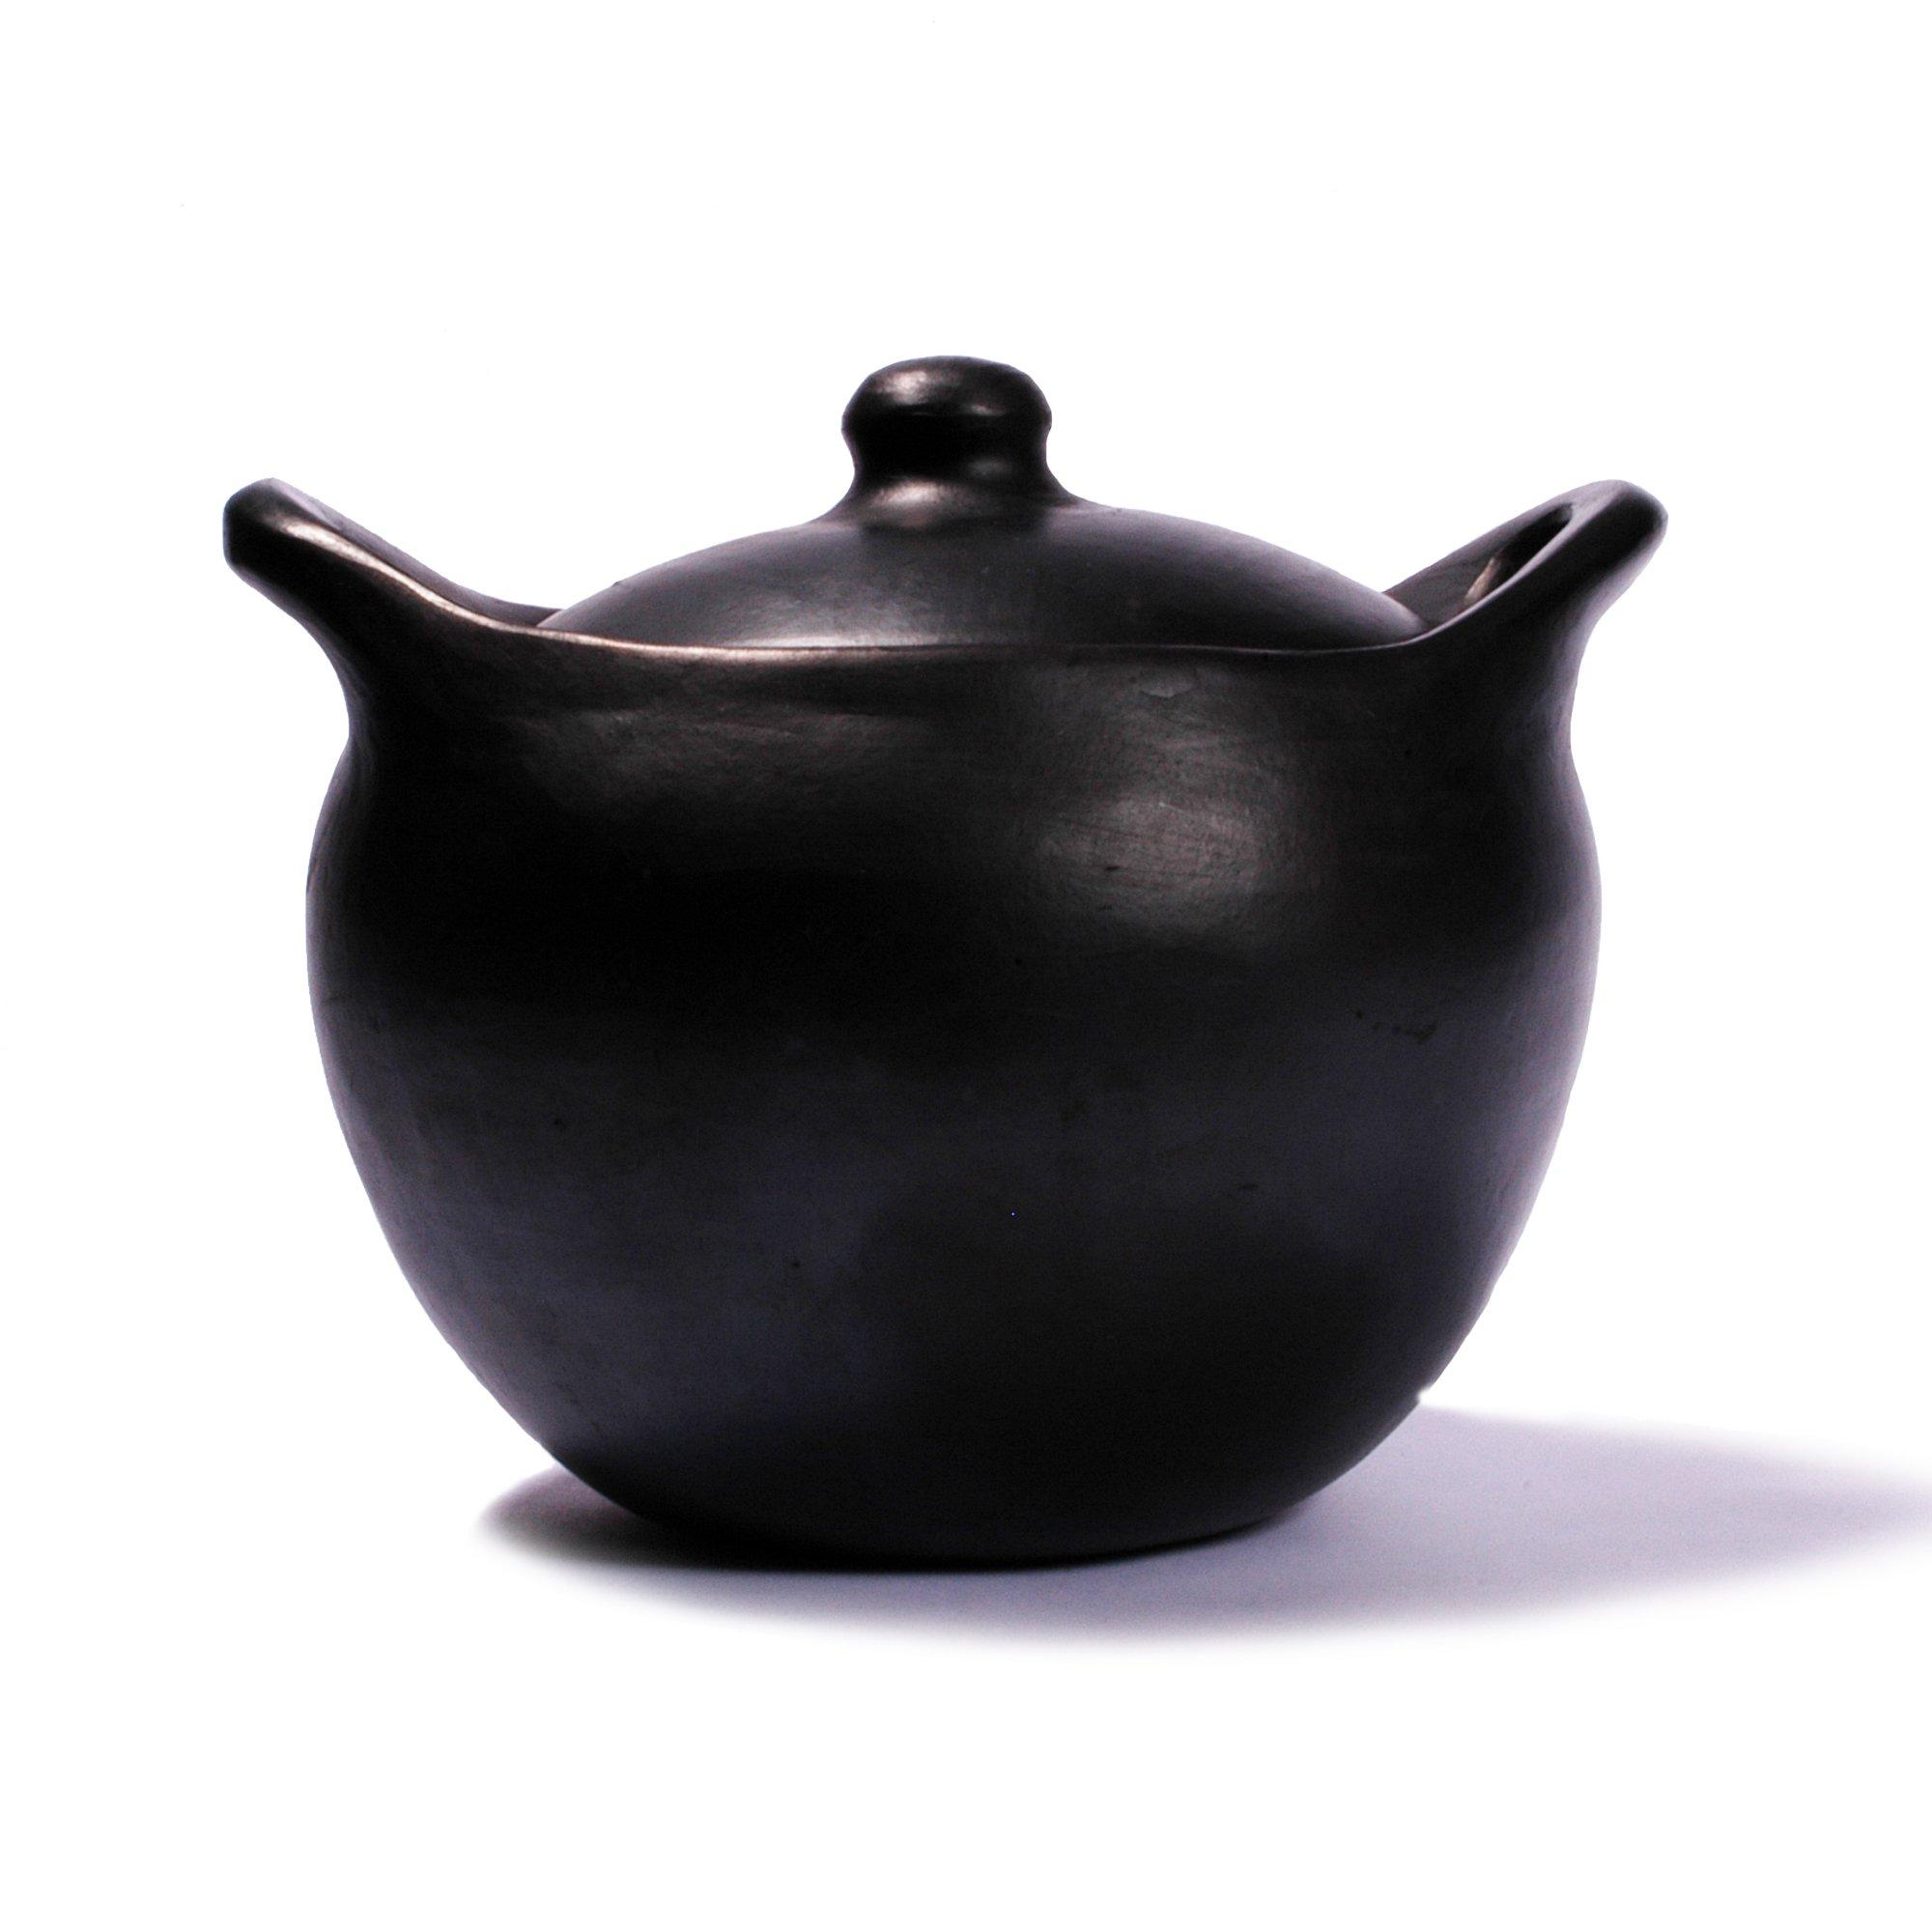 Ancient Cookware Black Clay, La Chamba Rounded Soup Pot - Medium - 4 quarts